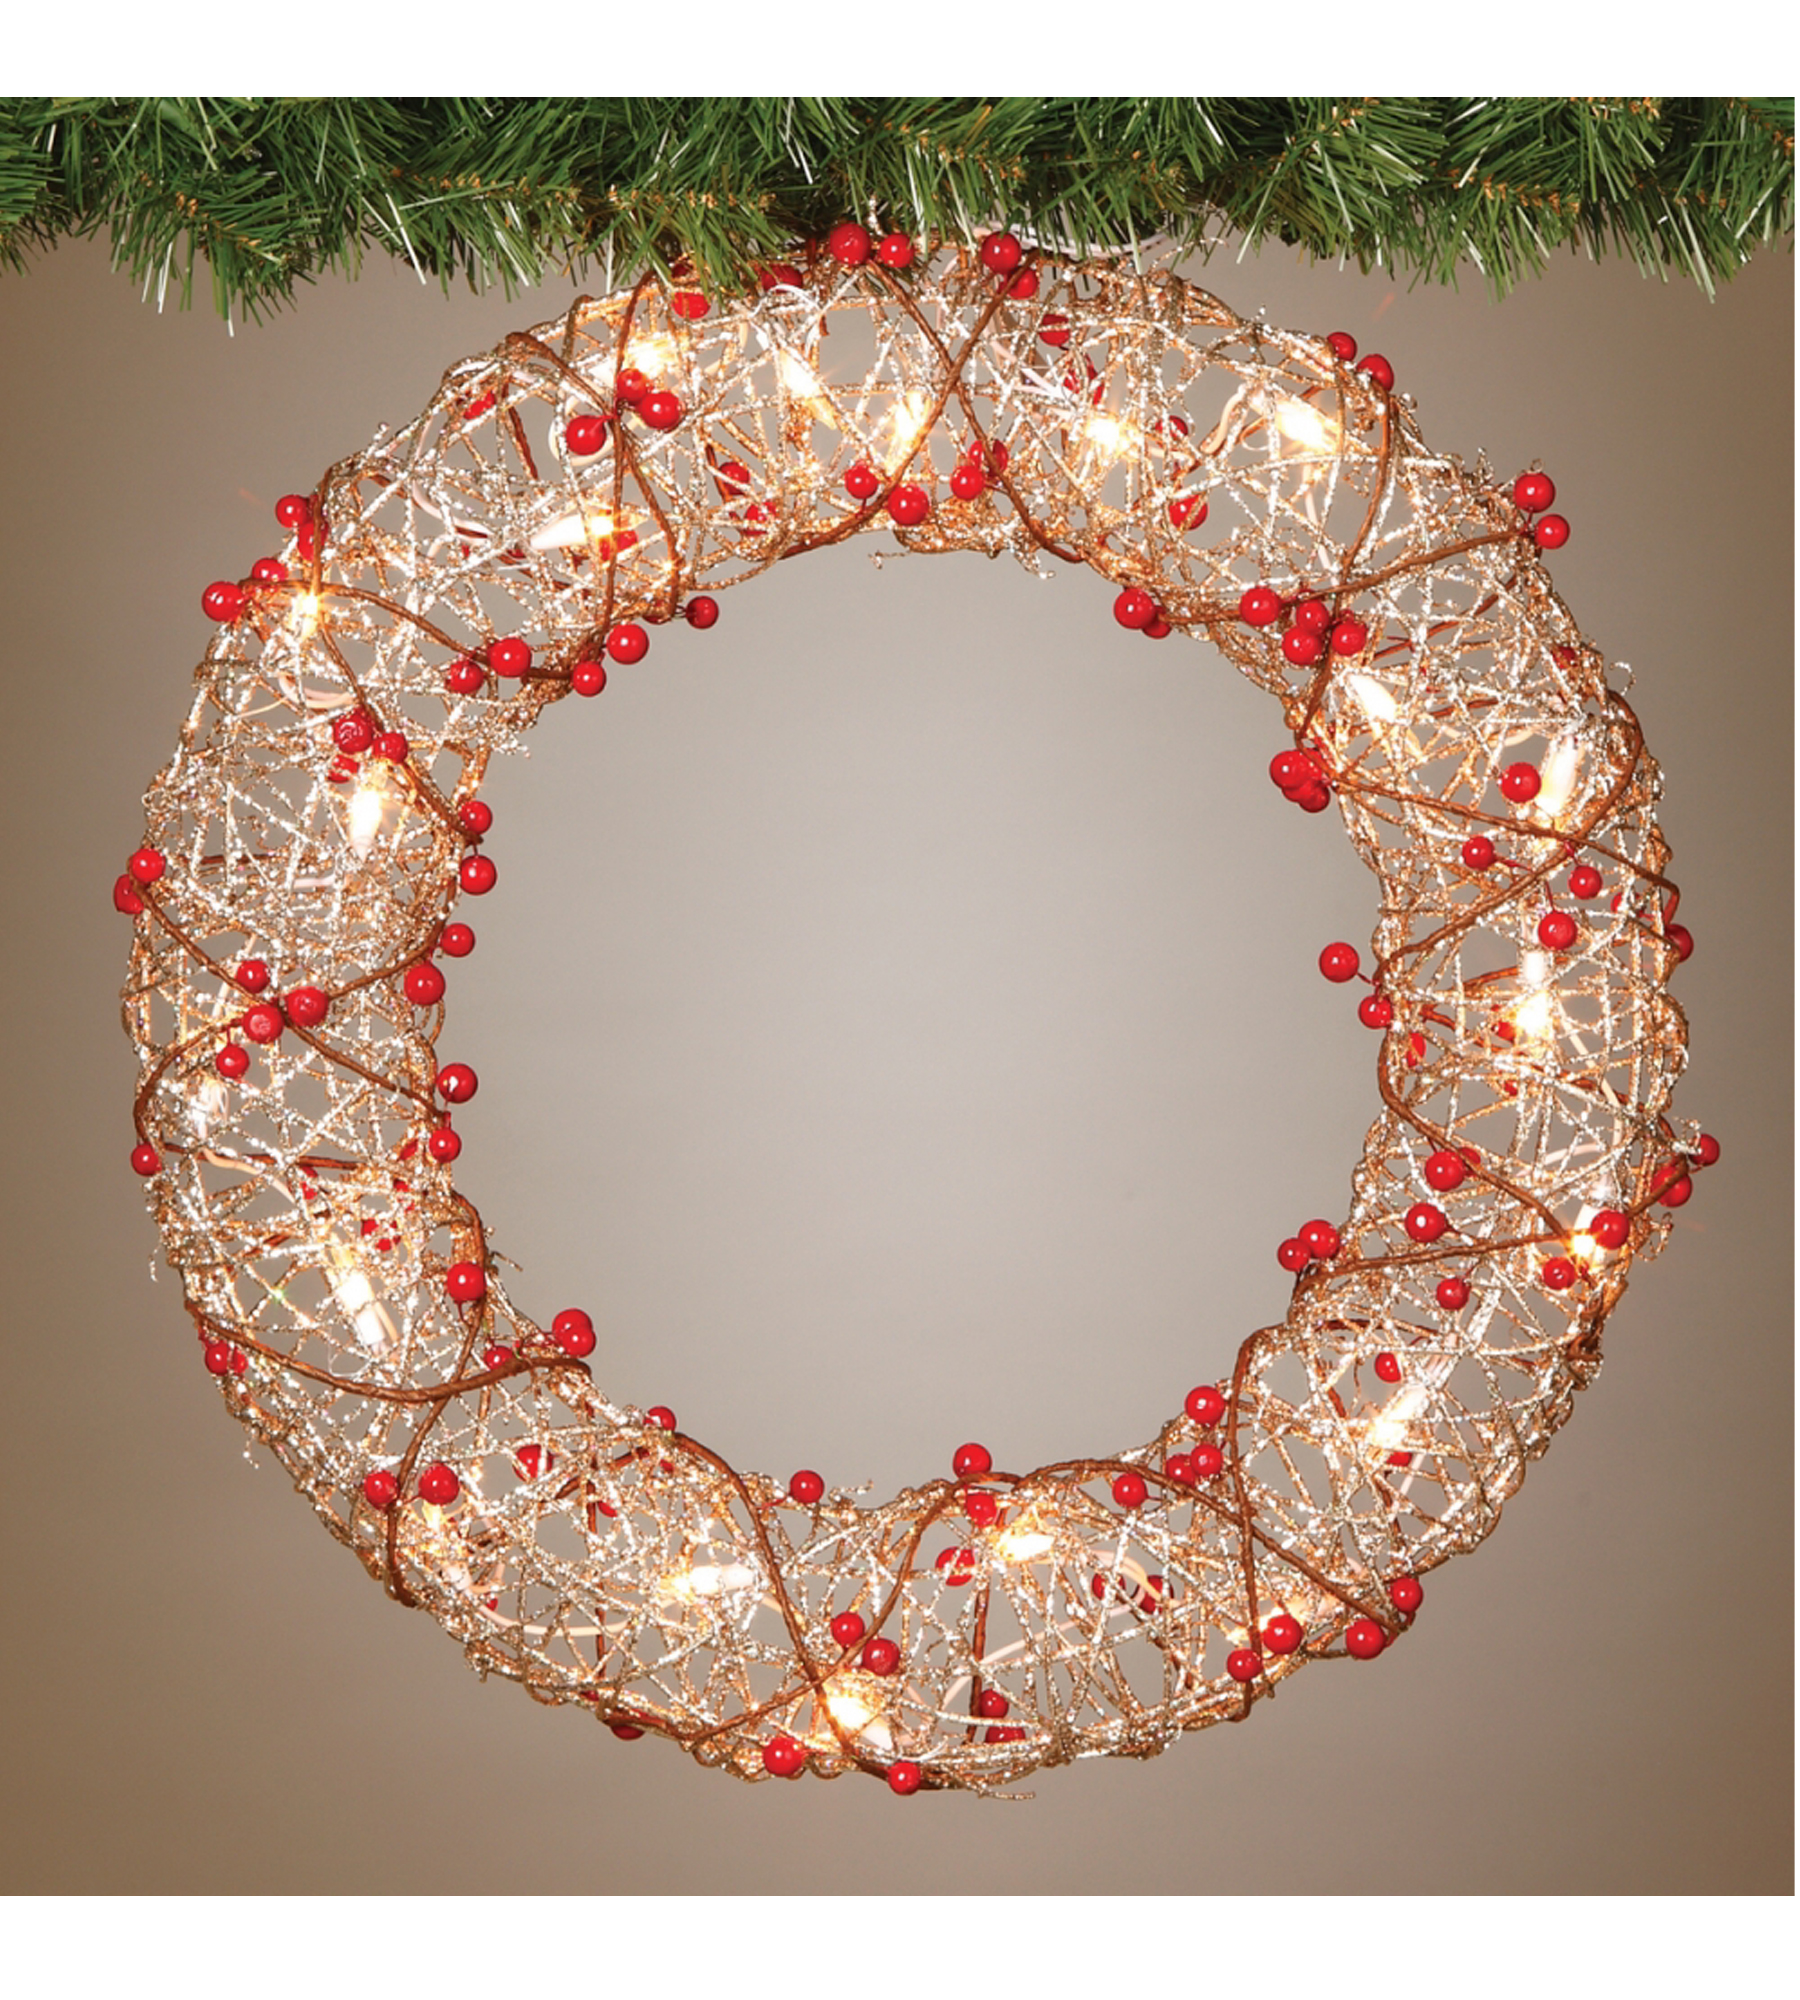 19 pre lit indoor outdoor champagne gold christmas wreath. Black Bedroom Furniture Sets. Home Design Ideas